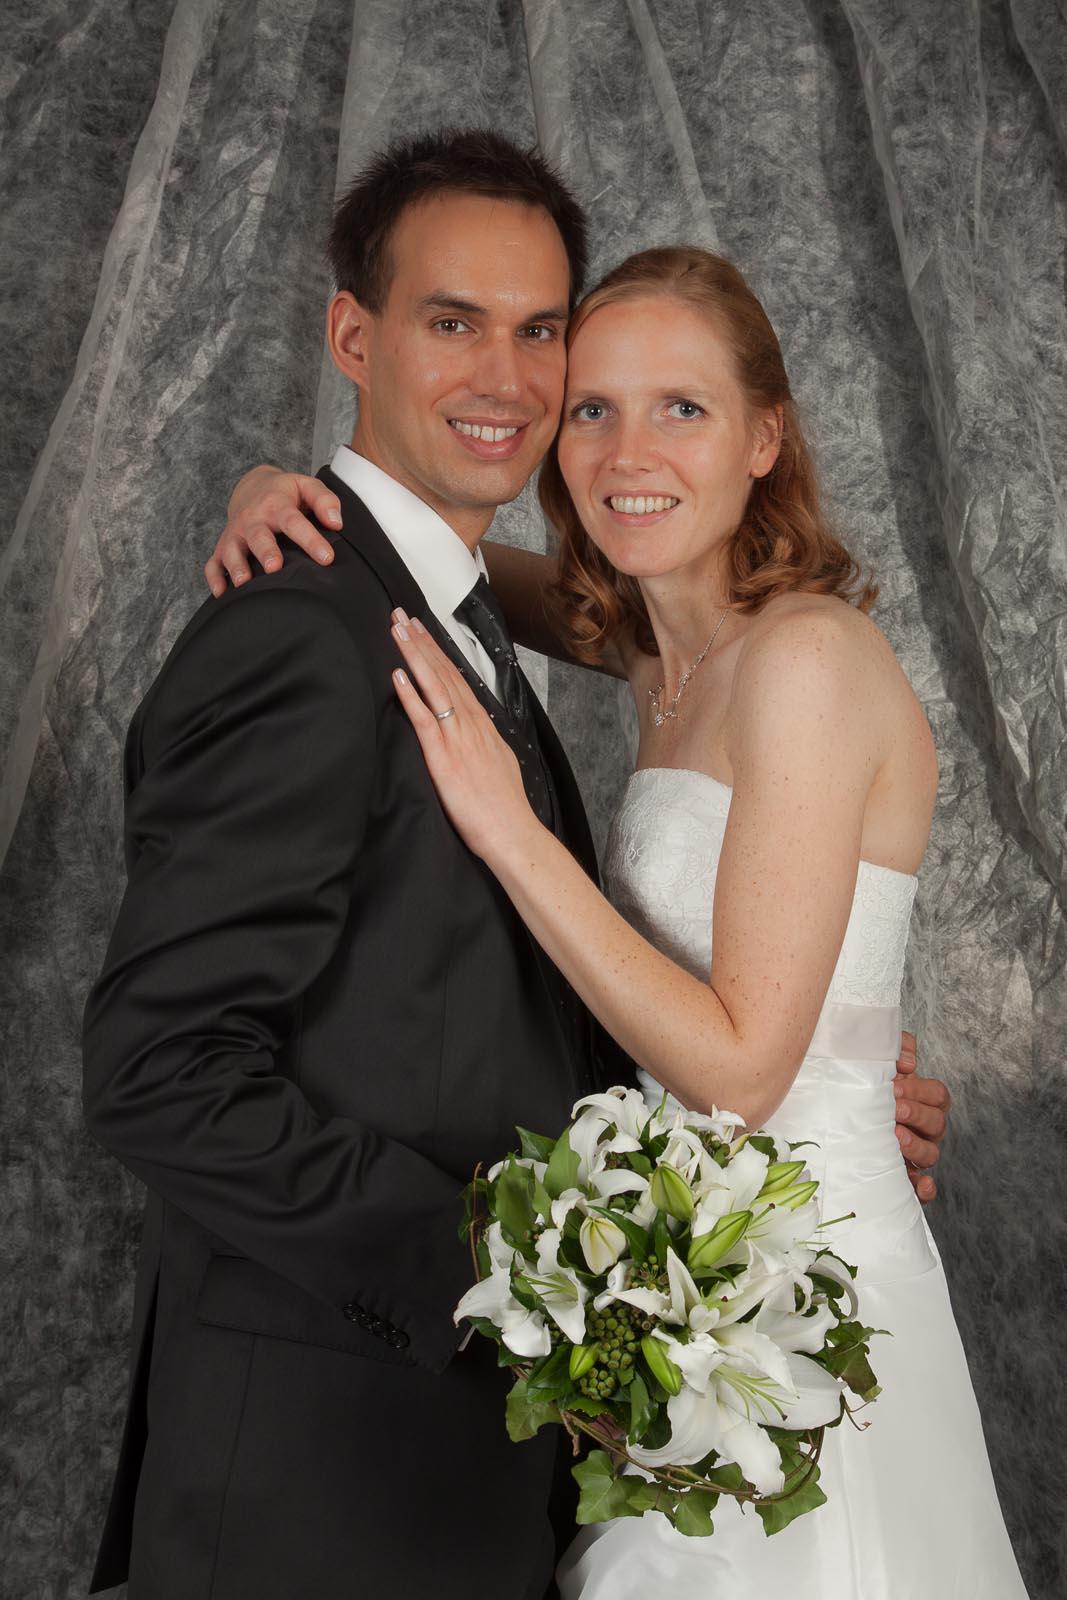 Hochzeitsportraits-Pohl-Pohler-Hochzeit-Pohl-Pohler-0460.jpg